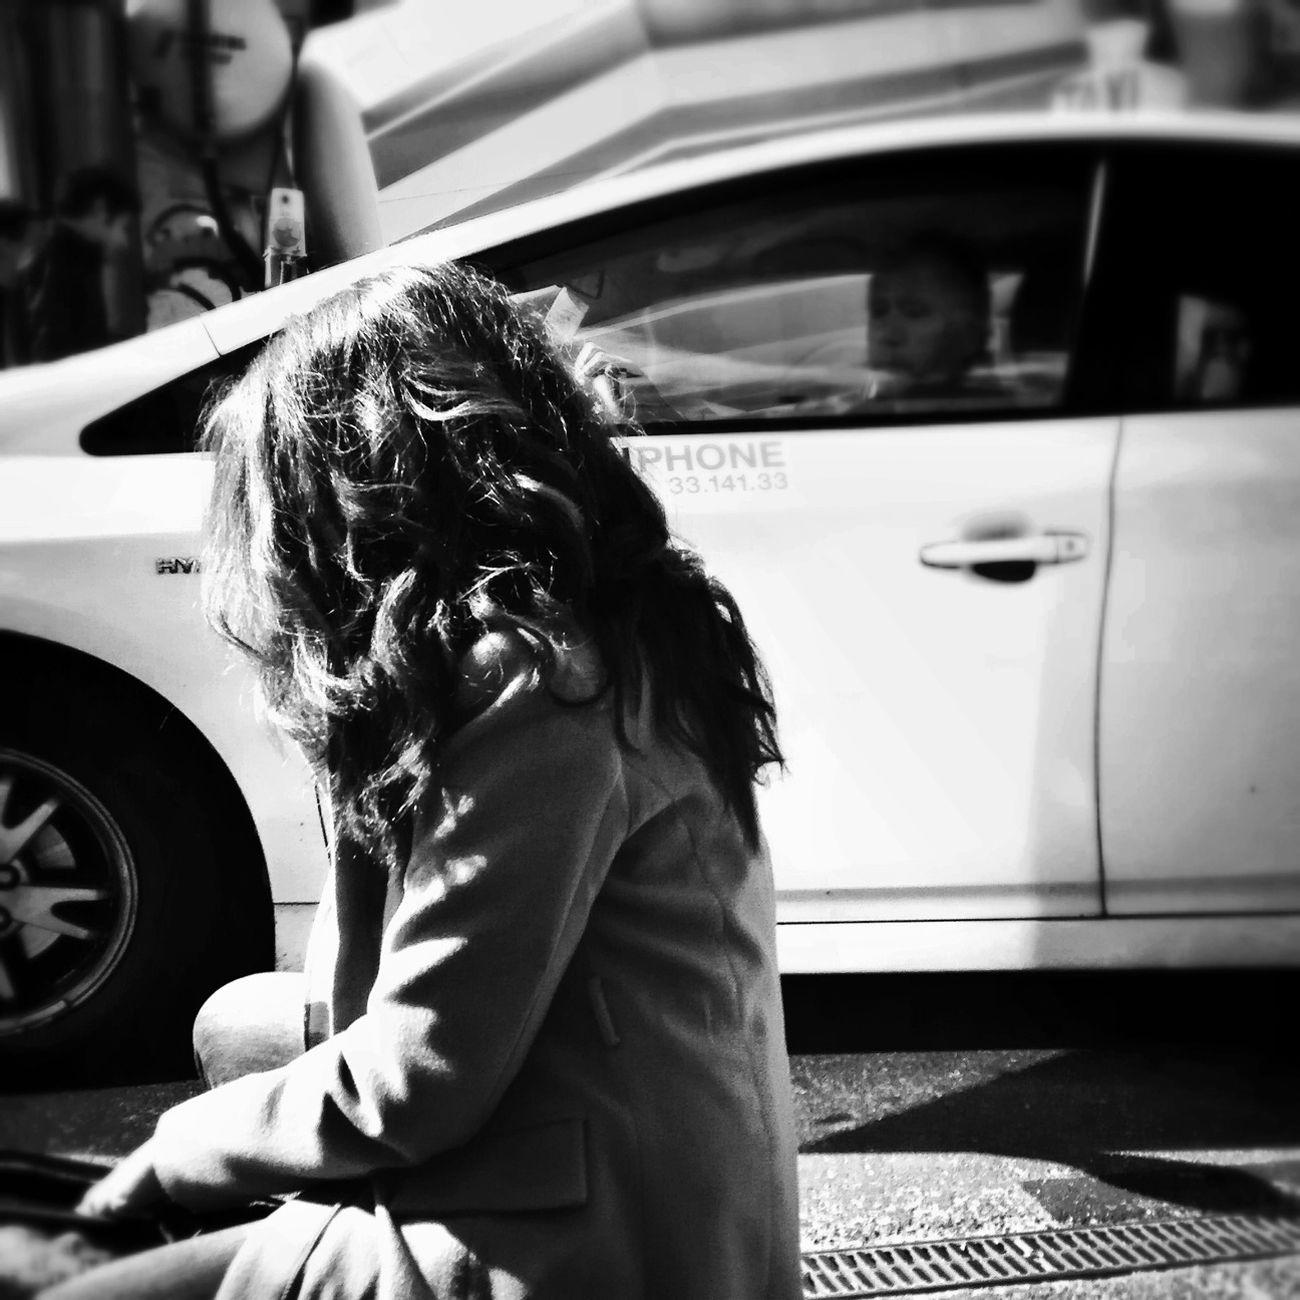 Streetphotography Poem Social Network Art NEM Street